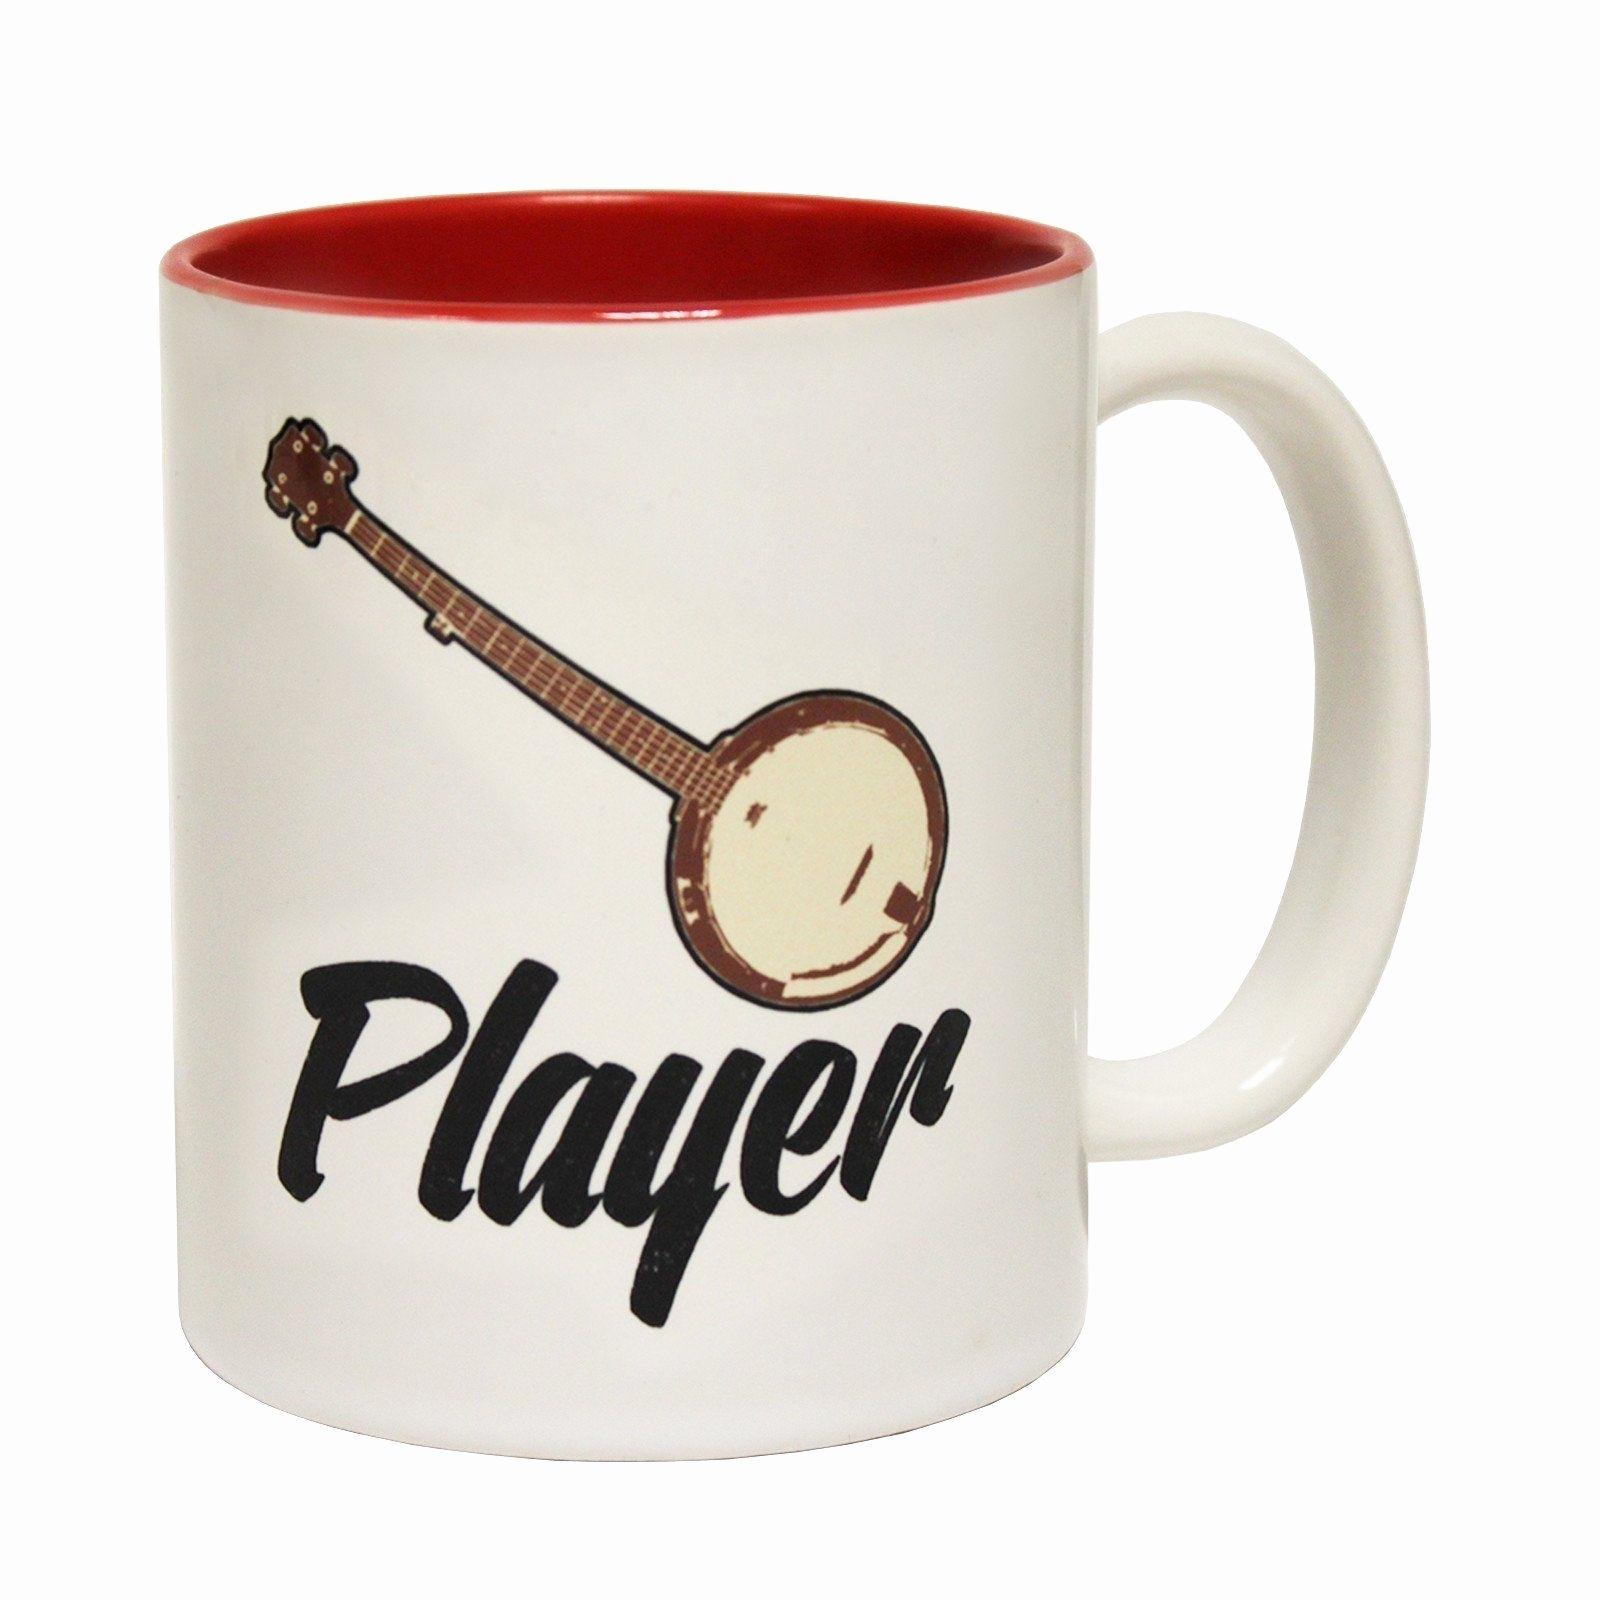 I Love Spreadsheets Mug Luxury Funny Mugs Banned Member